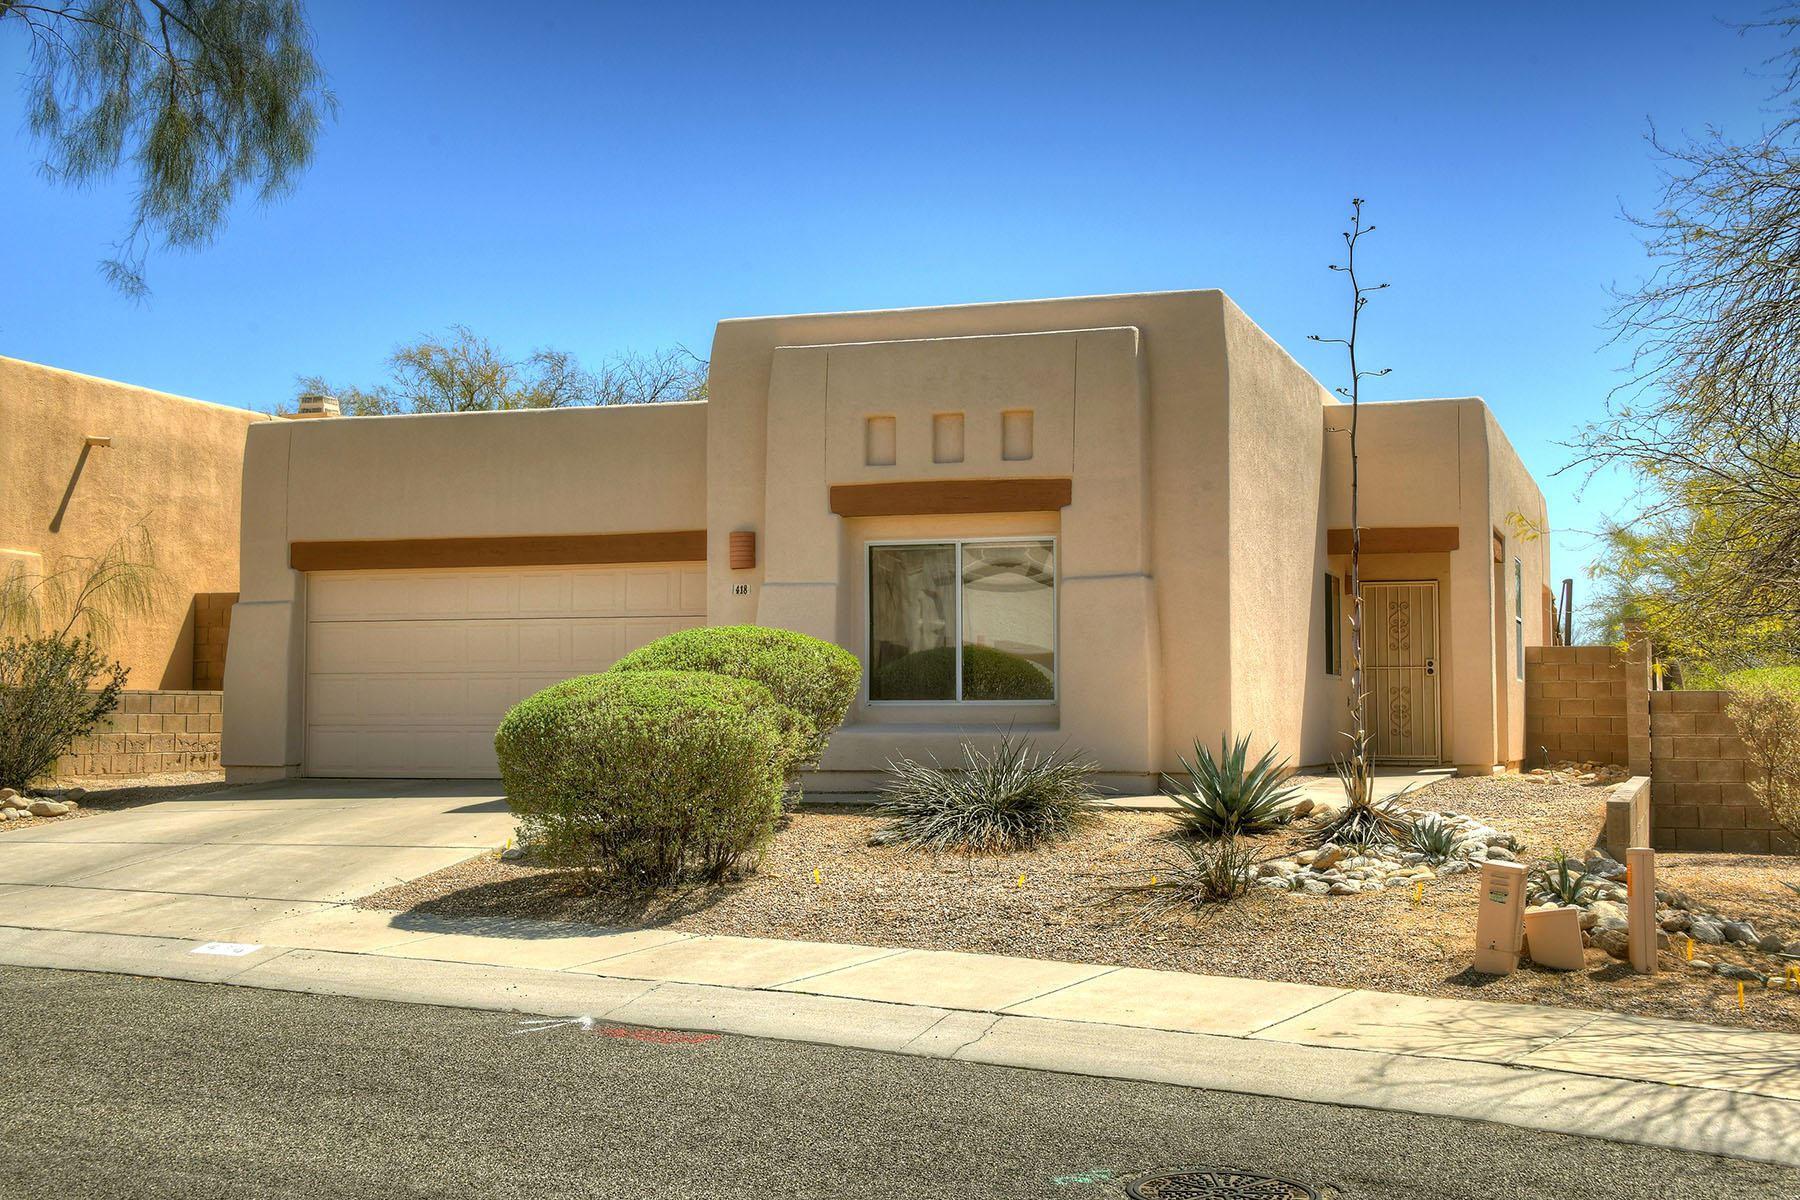 418 E Covered Wagon Drive, Tucson, AZ 85704 - MLS#: 22109387